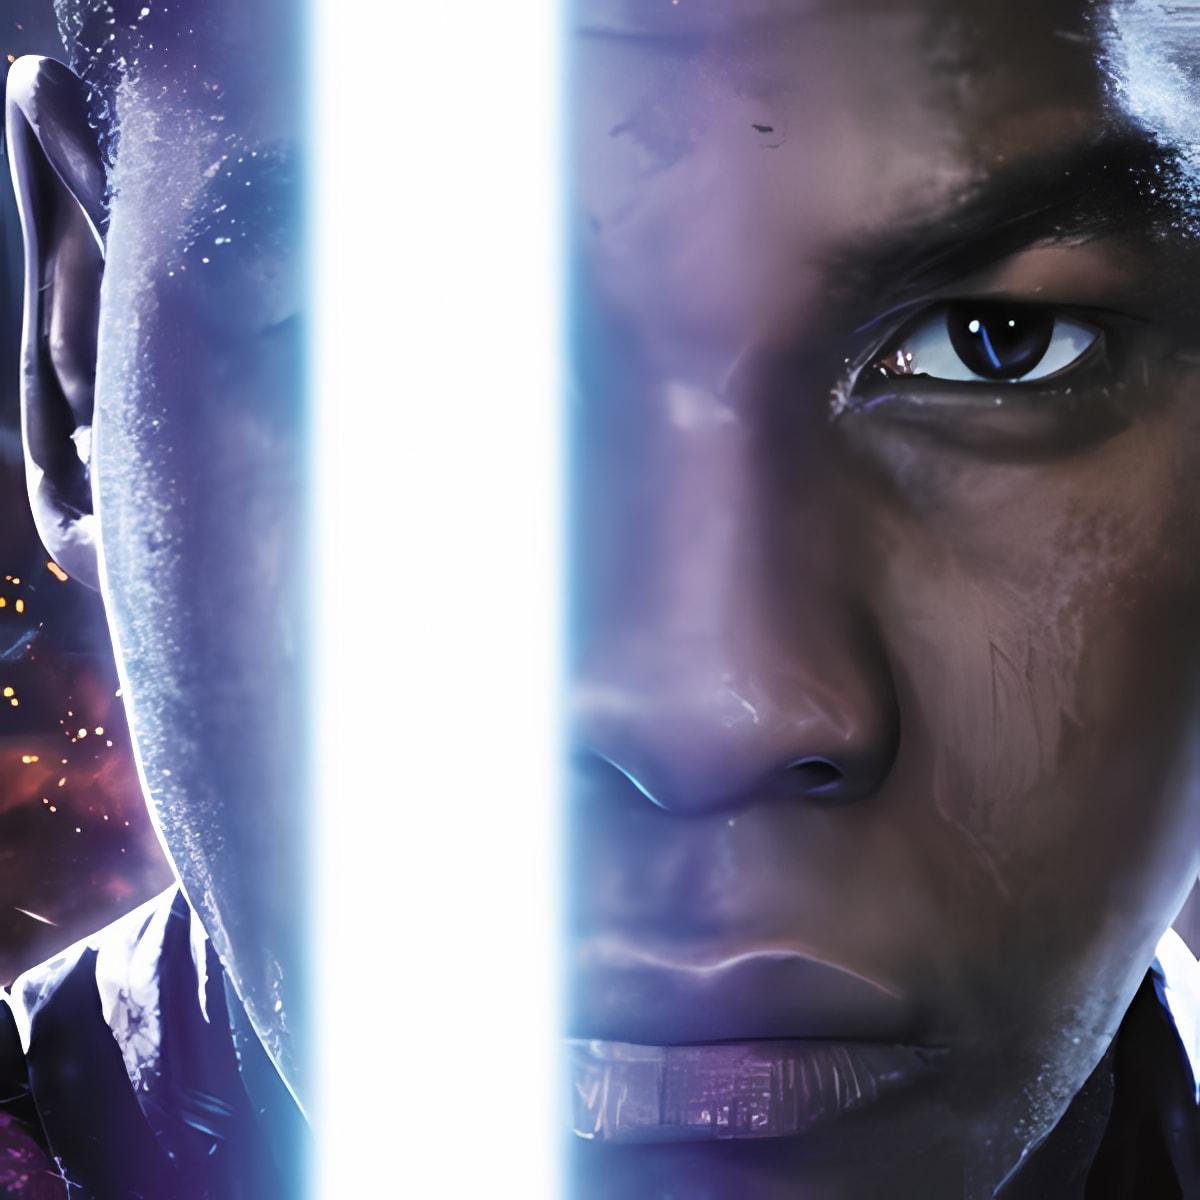 Star Wars Episode 7 - The Force awakens Themepack 1